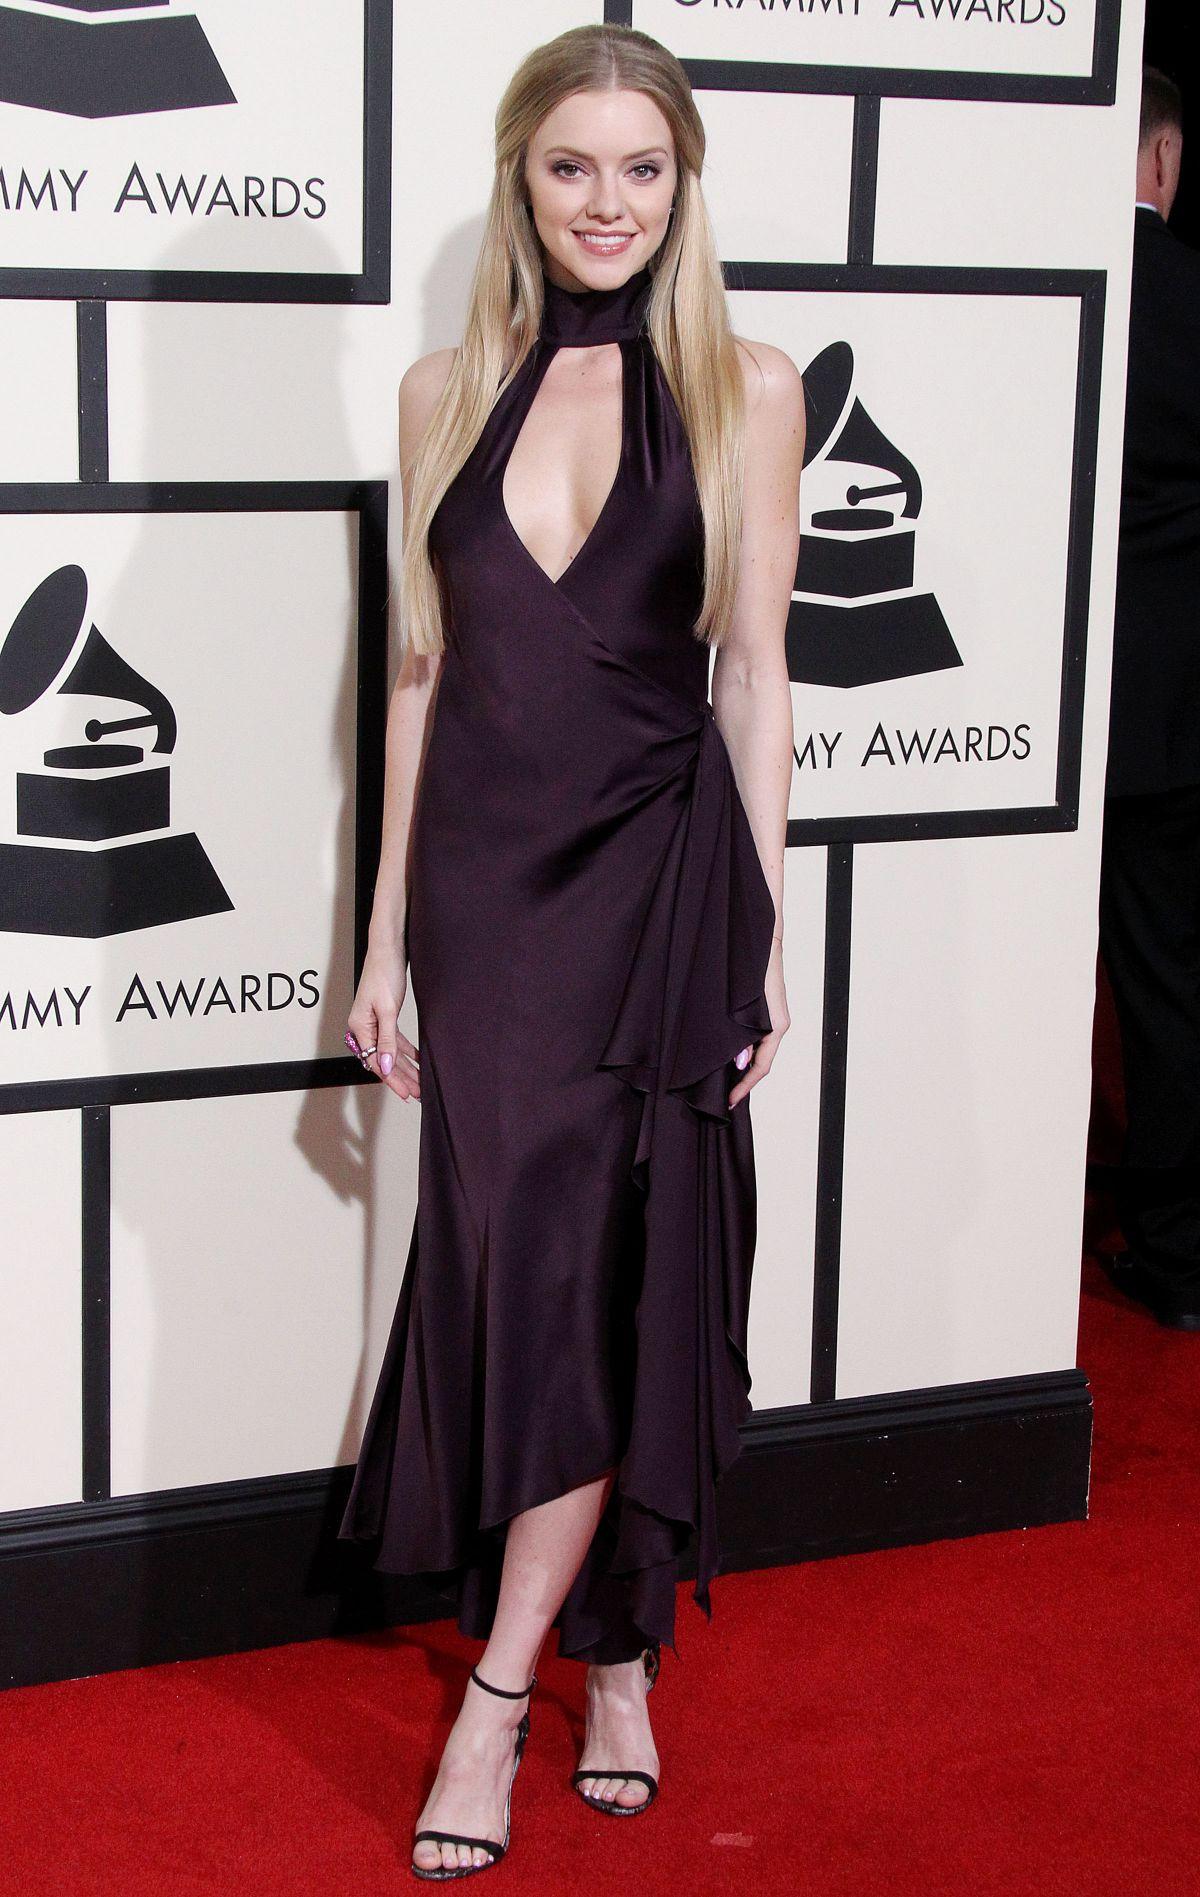 ELLE EVNS at Grammy Awards 2016 in Los Angeles 02/15/2016